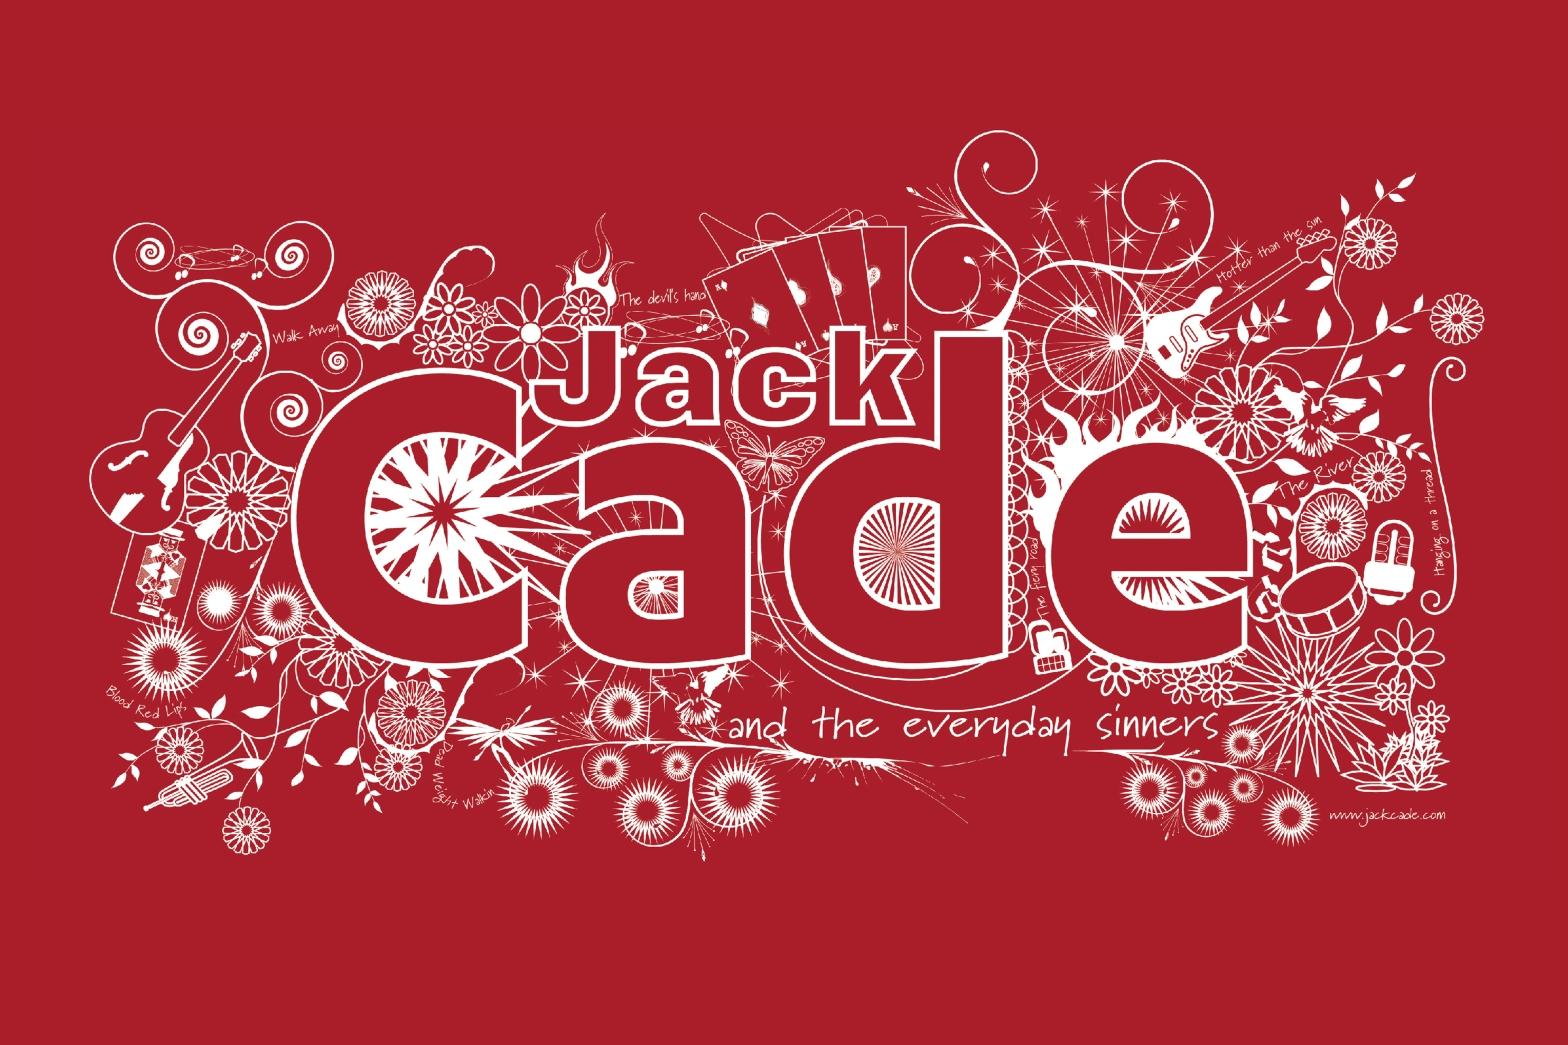 Jack Cade branding